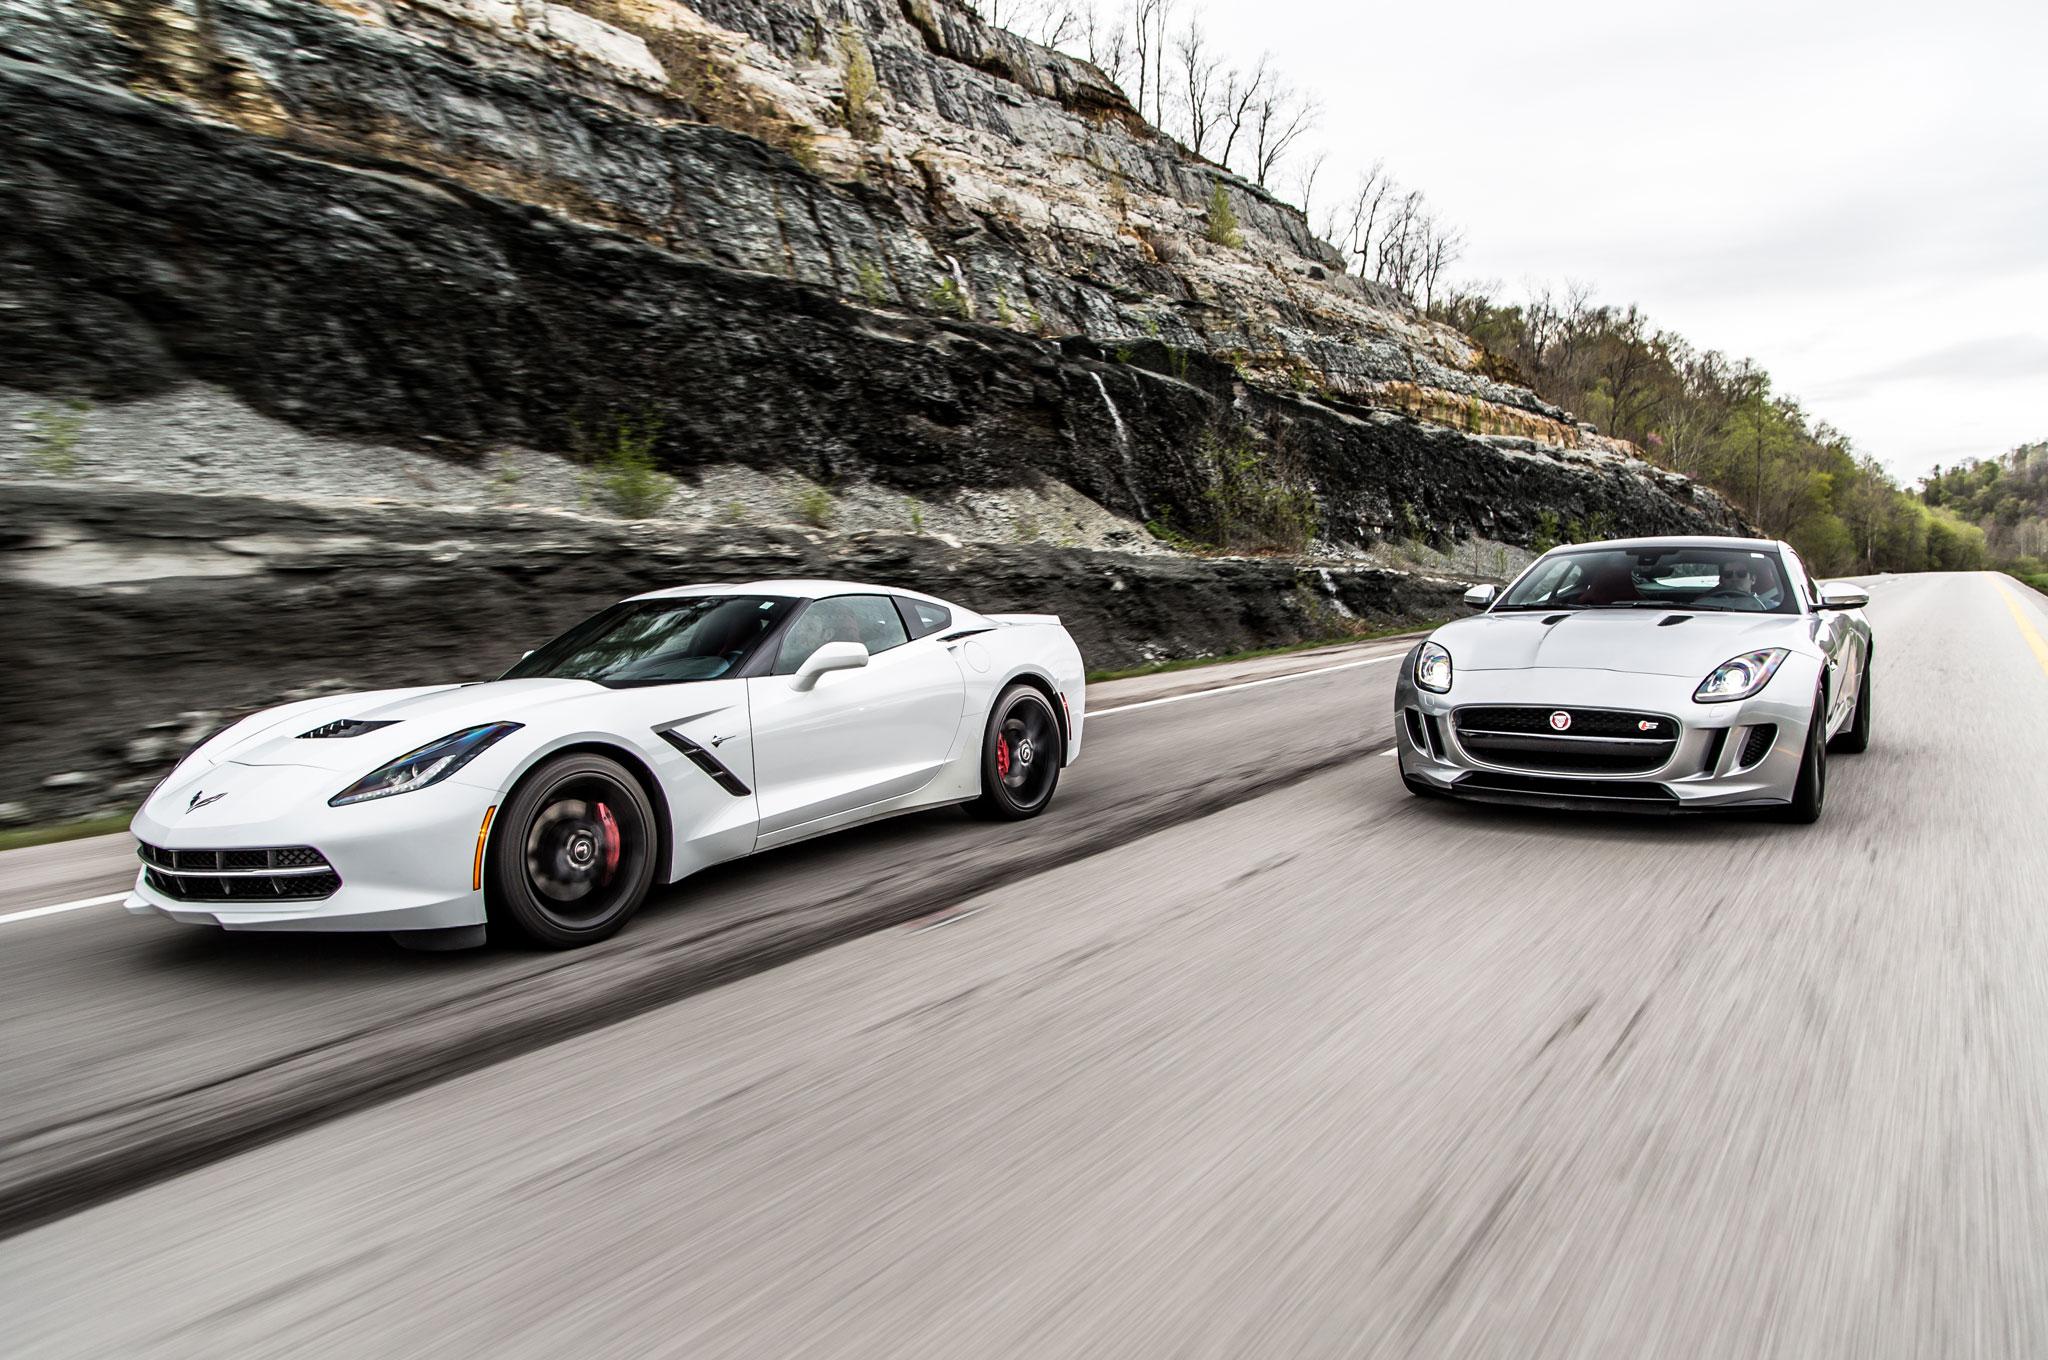 2014 Jaguar F Type S Coupe And 2015 Chevrolet Corvette Stingray Z51 22